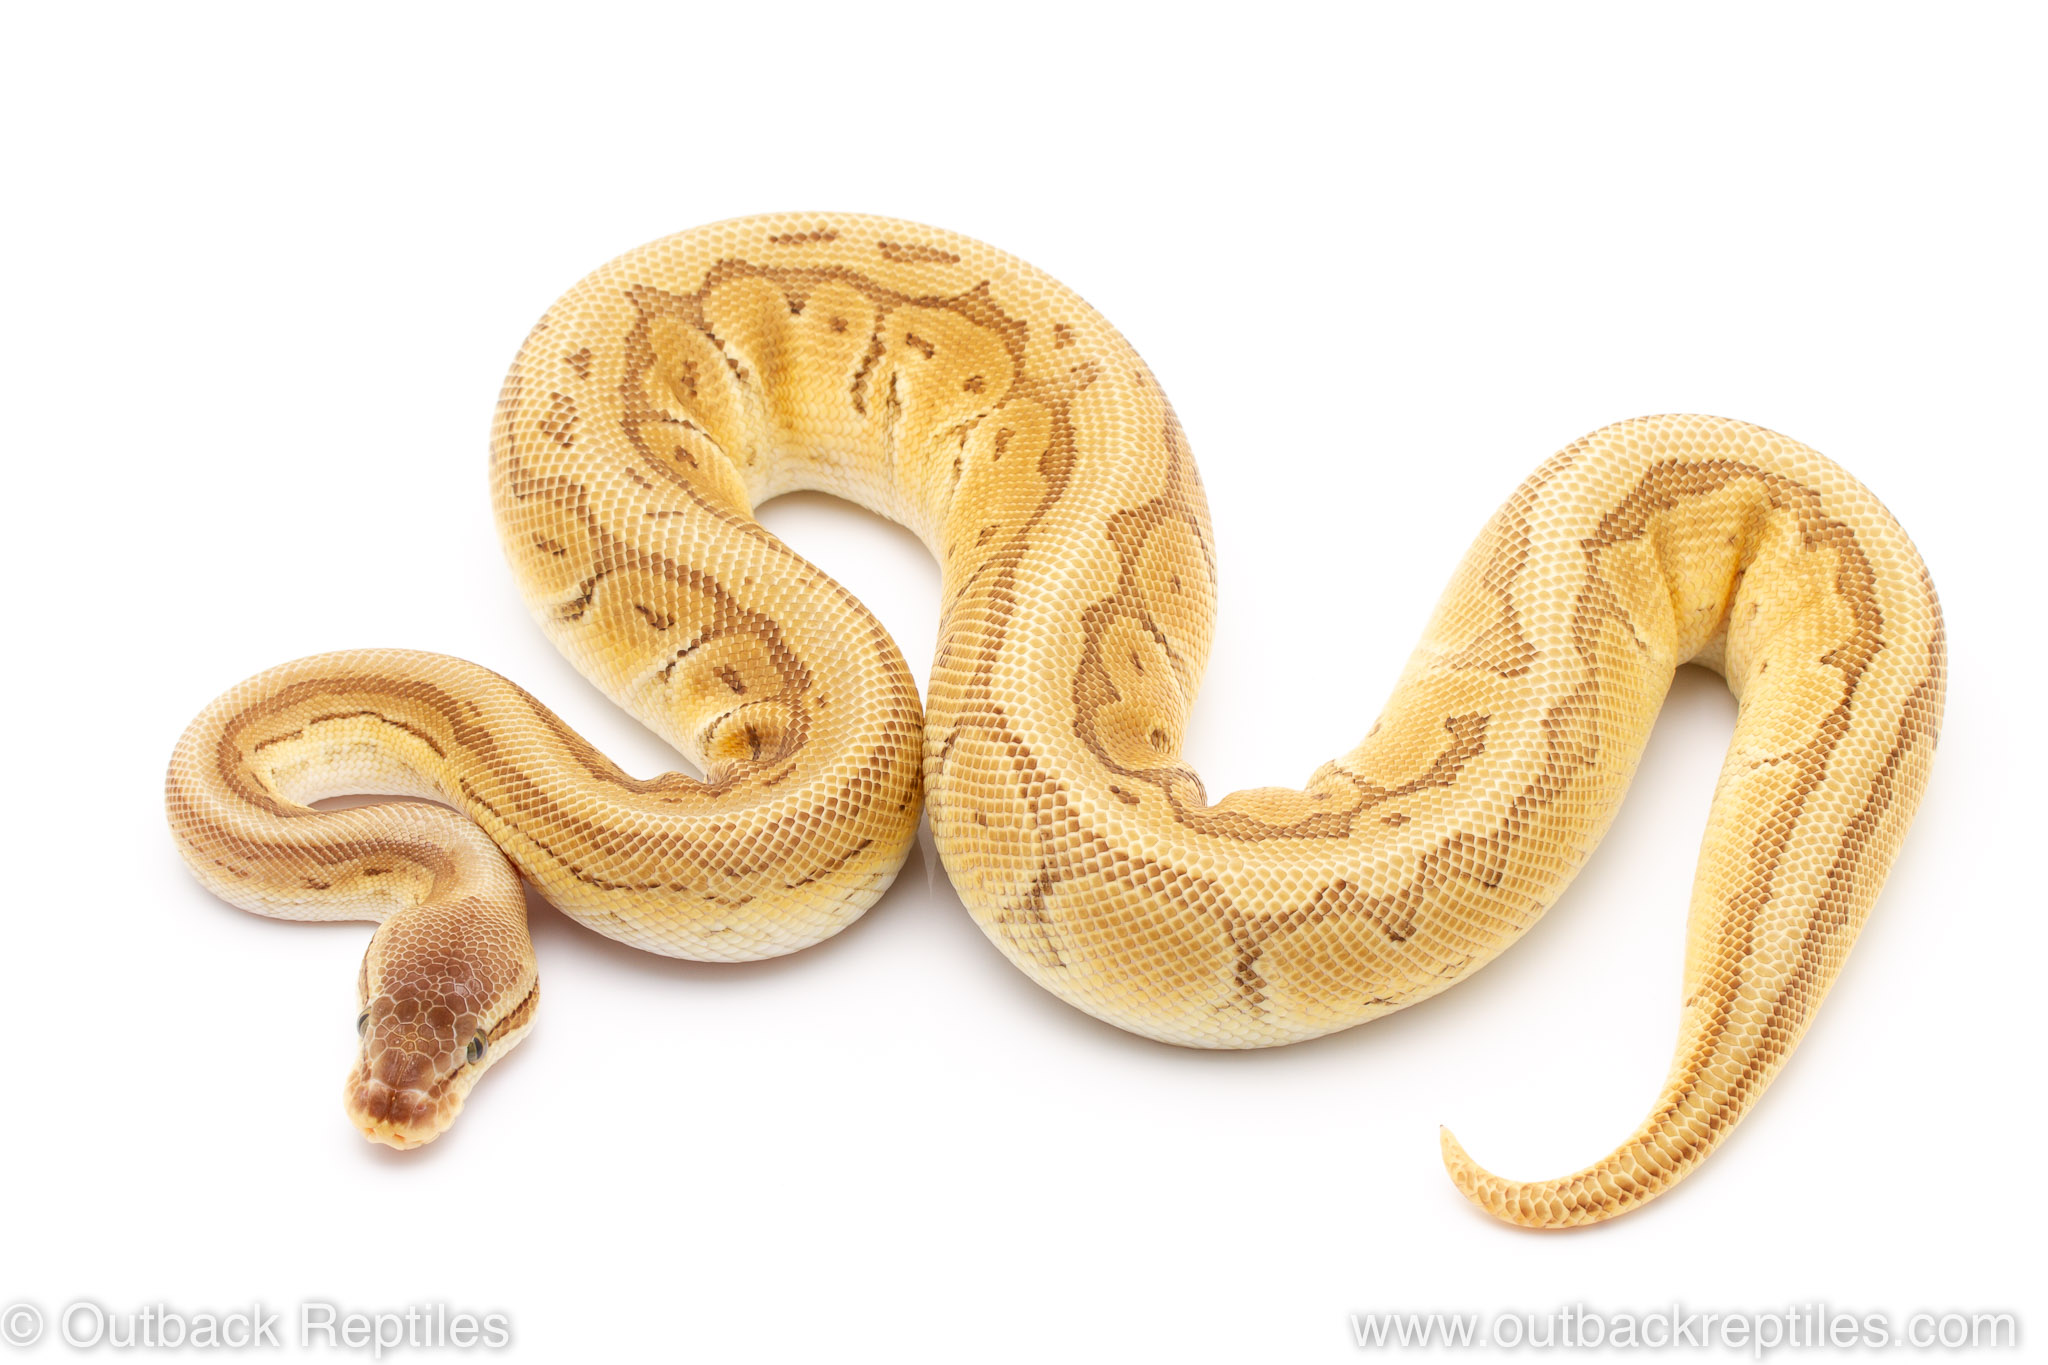 Orange Dream Pastel Lesser Pinstripe ball pythons for sale